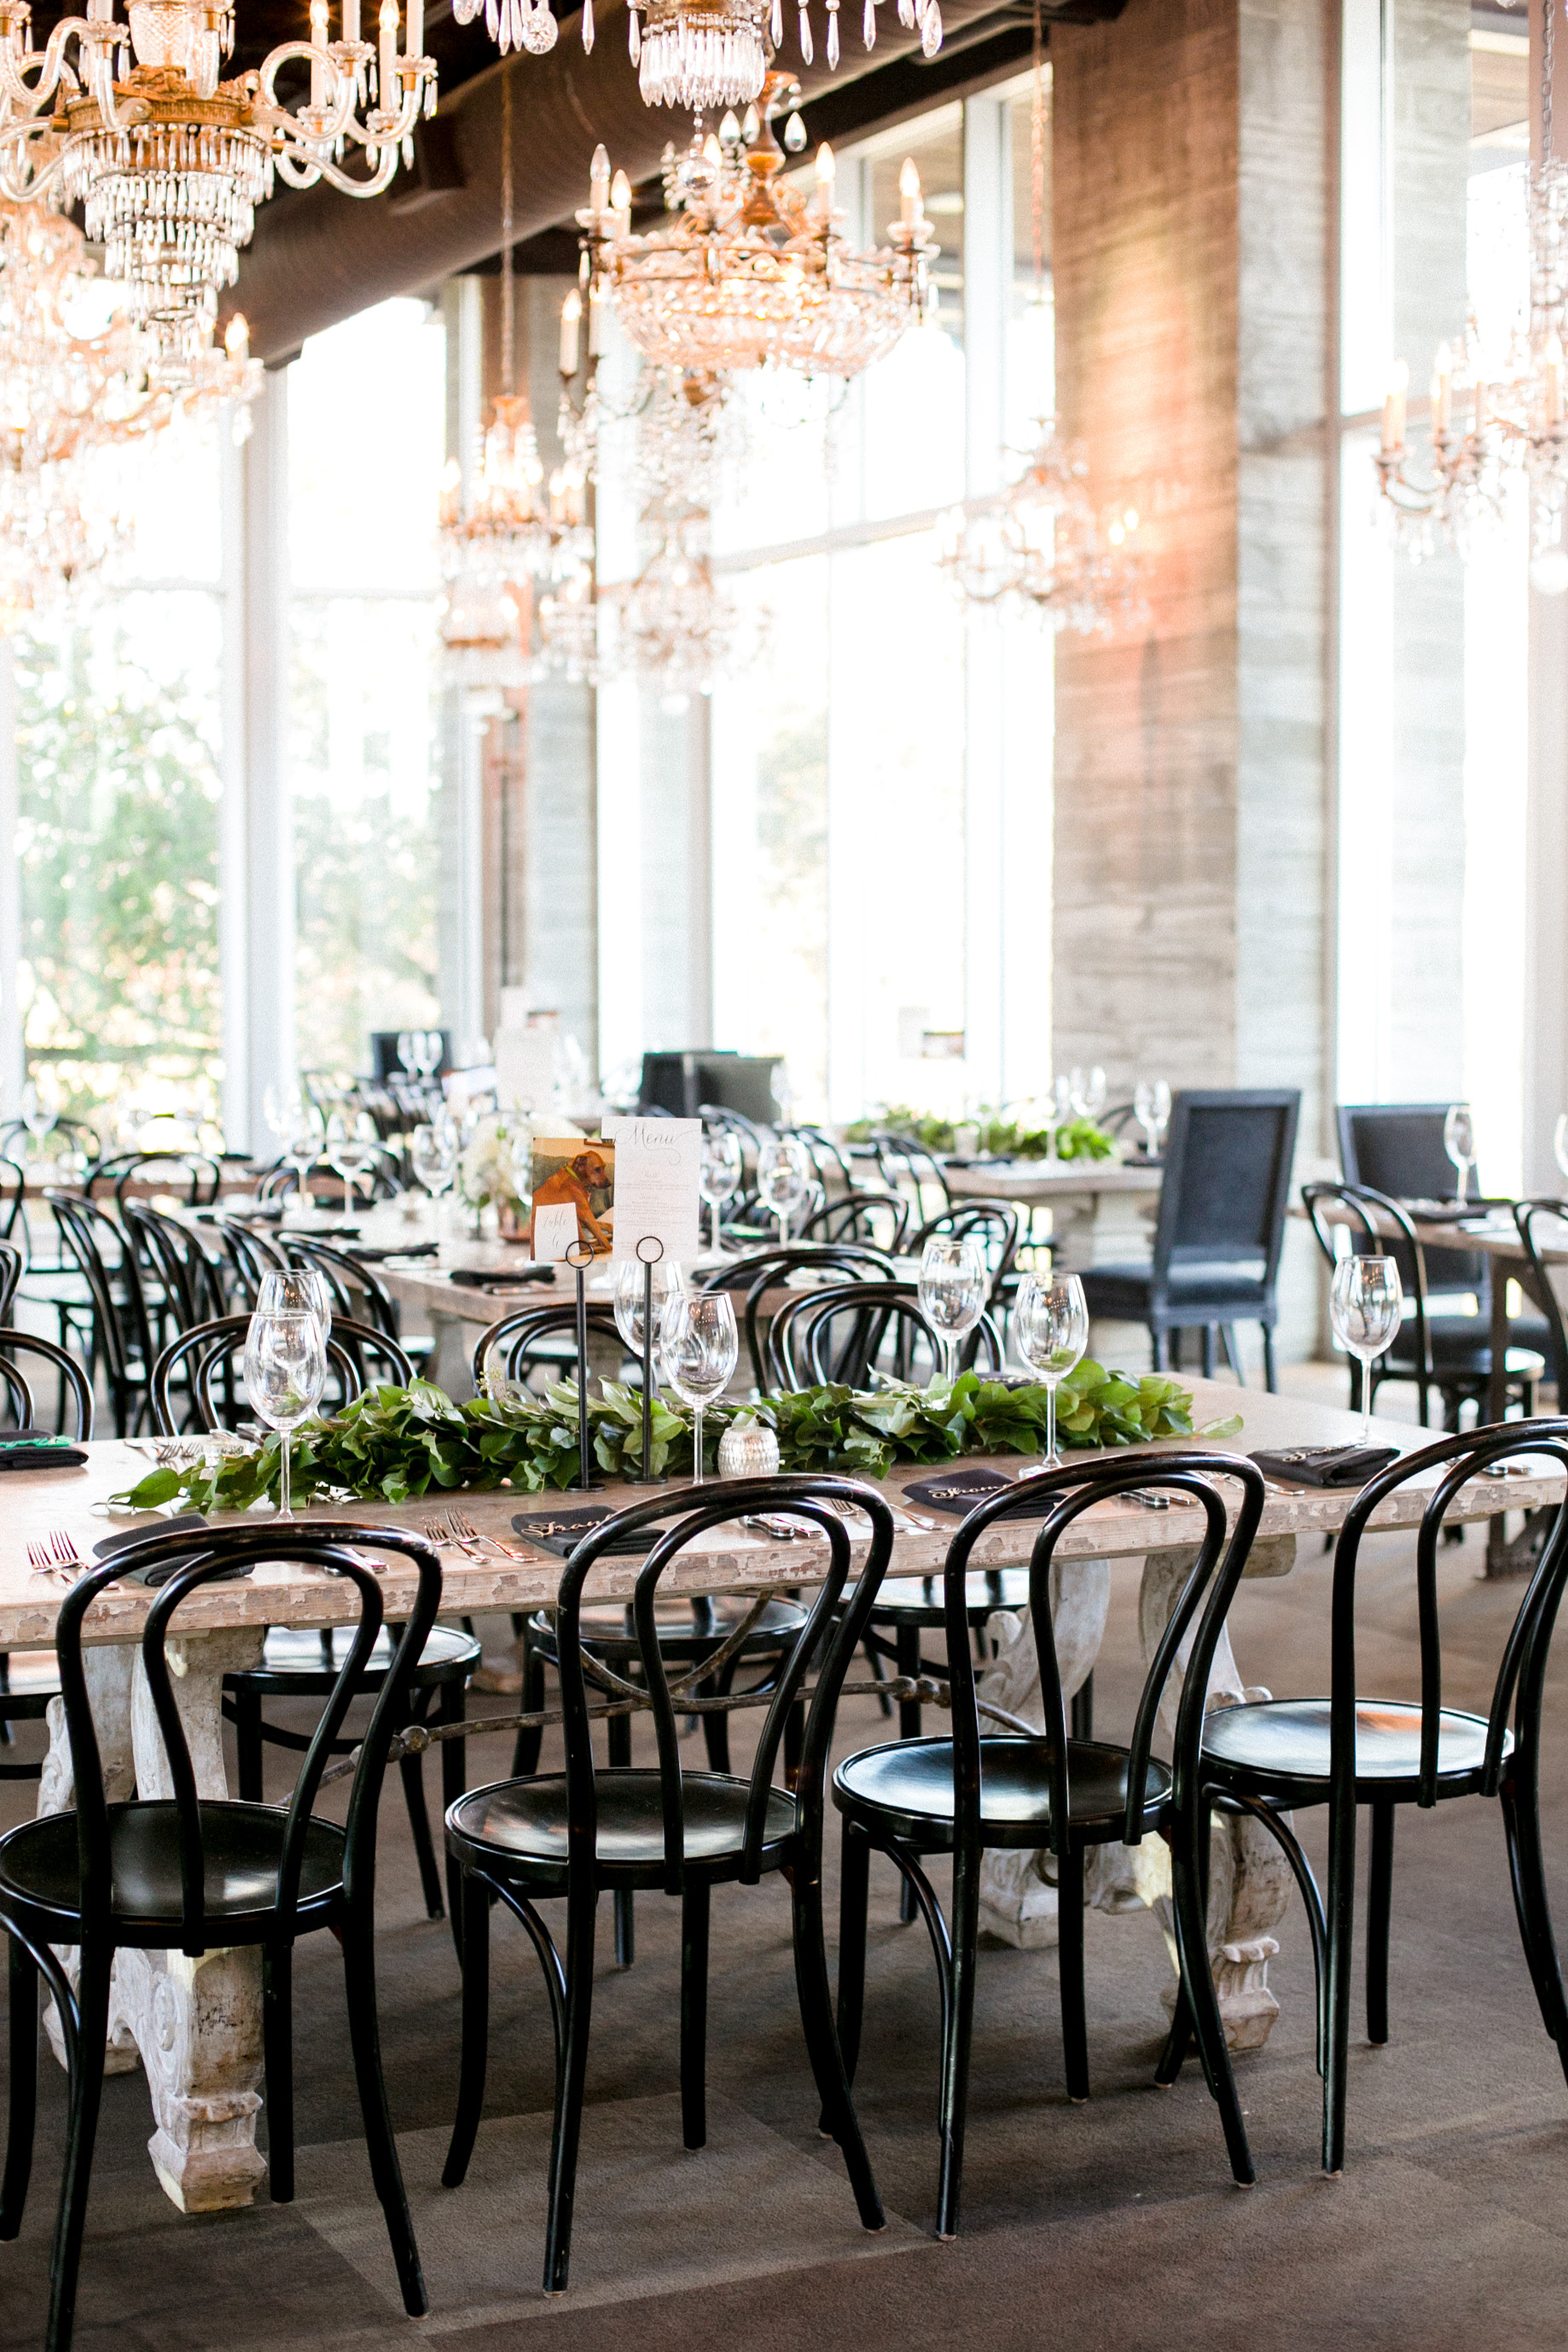 The Dunlavy Weddings | Garden Style Wedding Venues in Houston